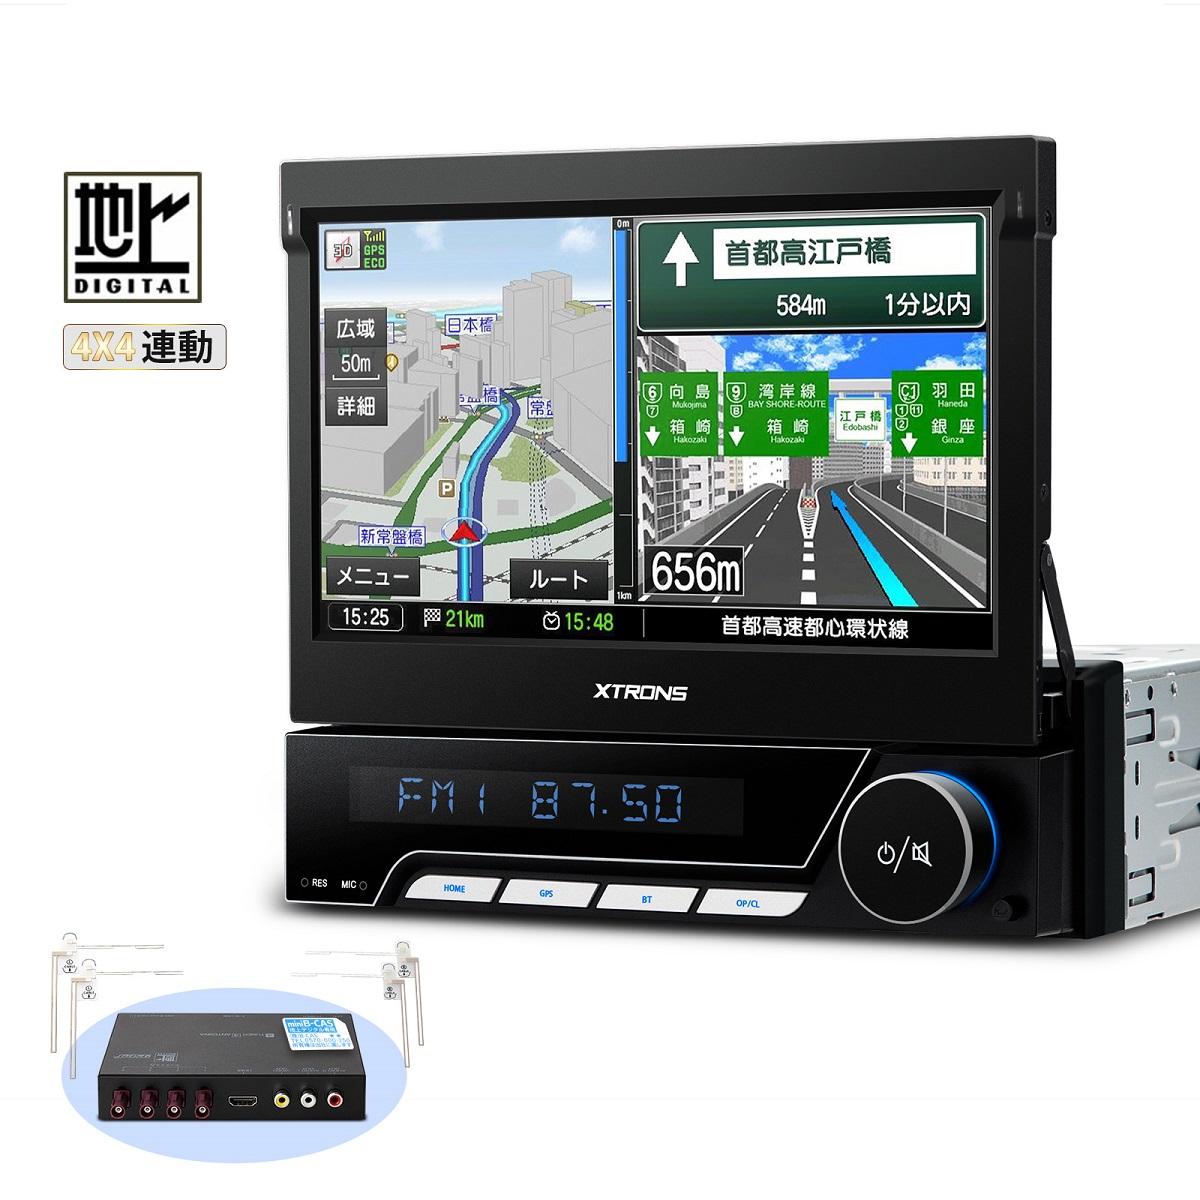 (D771GISY) XTRONS 7インチ 1DIN 静電式車載PC カーナビ 4x4地デジ搭載 フルセグ アプリ連動操作可能 最新ゼンリン8G観光地図 DVDプレーヤー Bluetooth ラジオ GPS USB SD対応 多彩なLED 全画面シェア 角度調整可